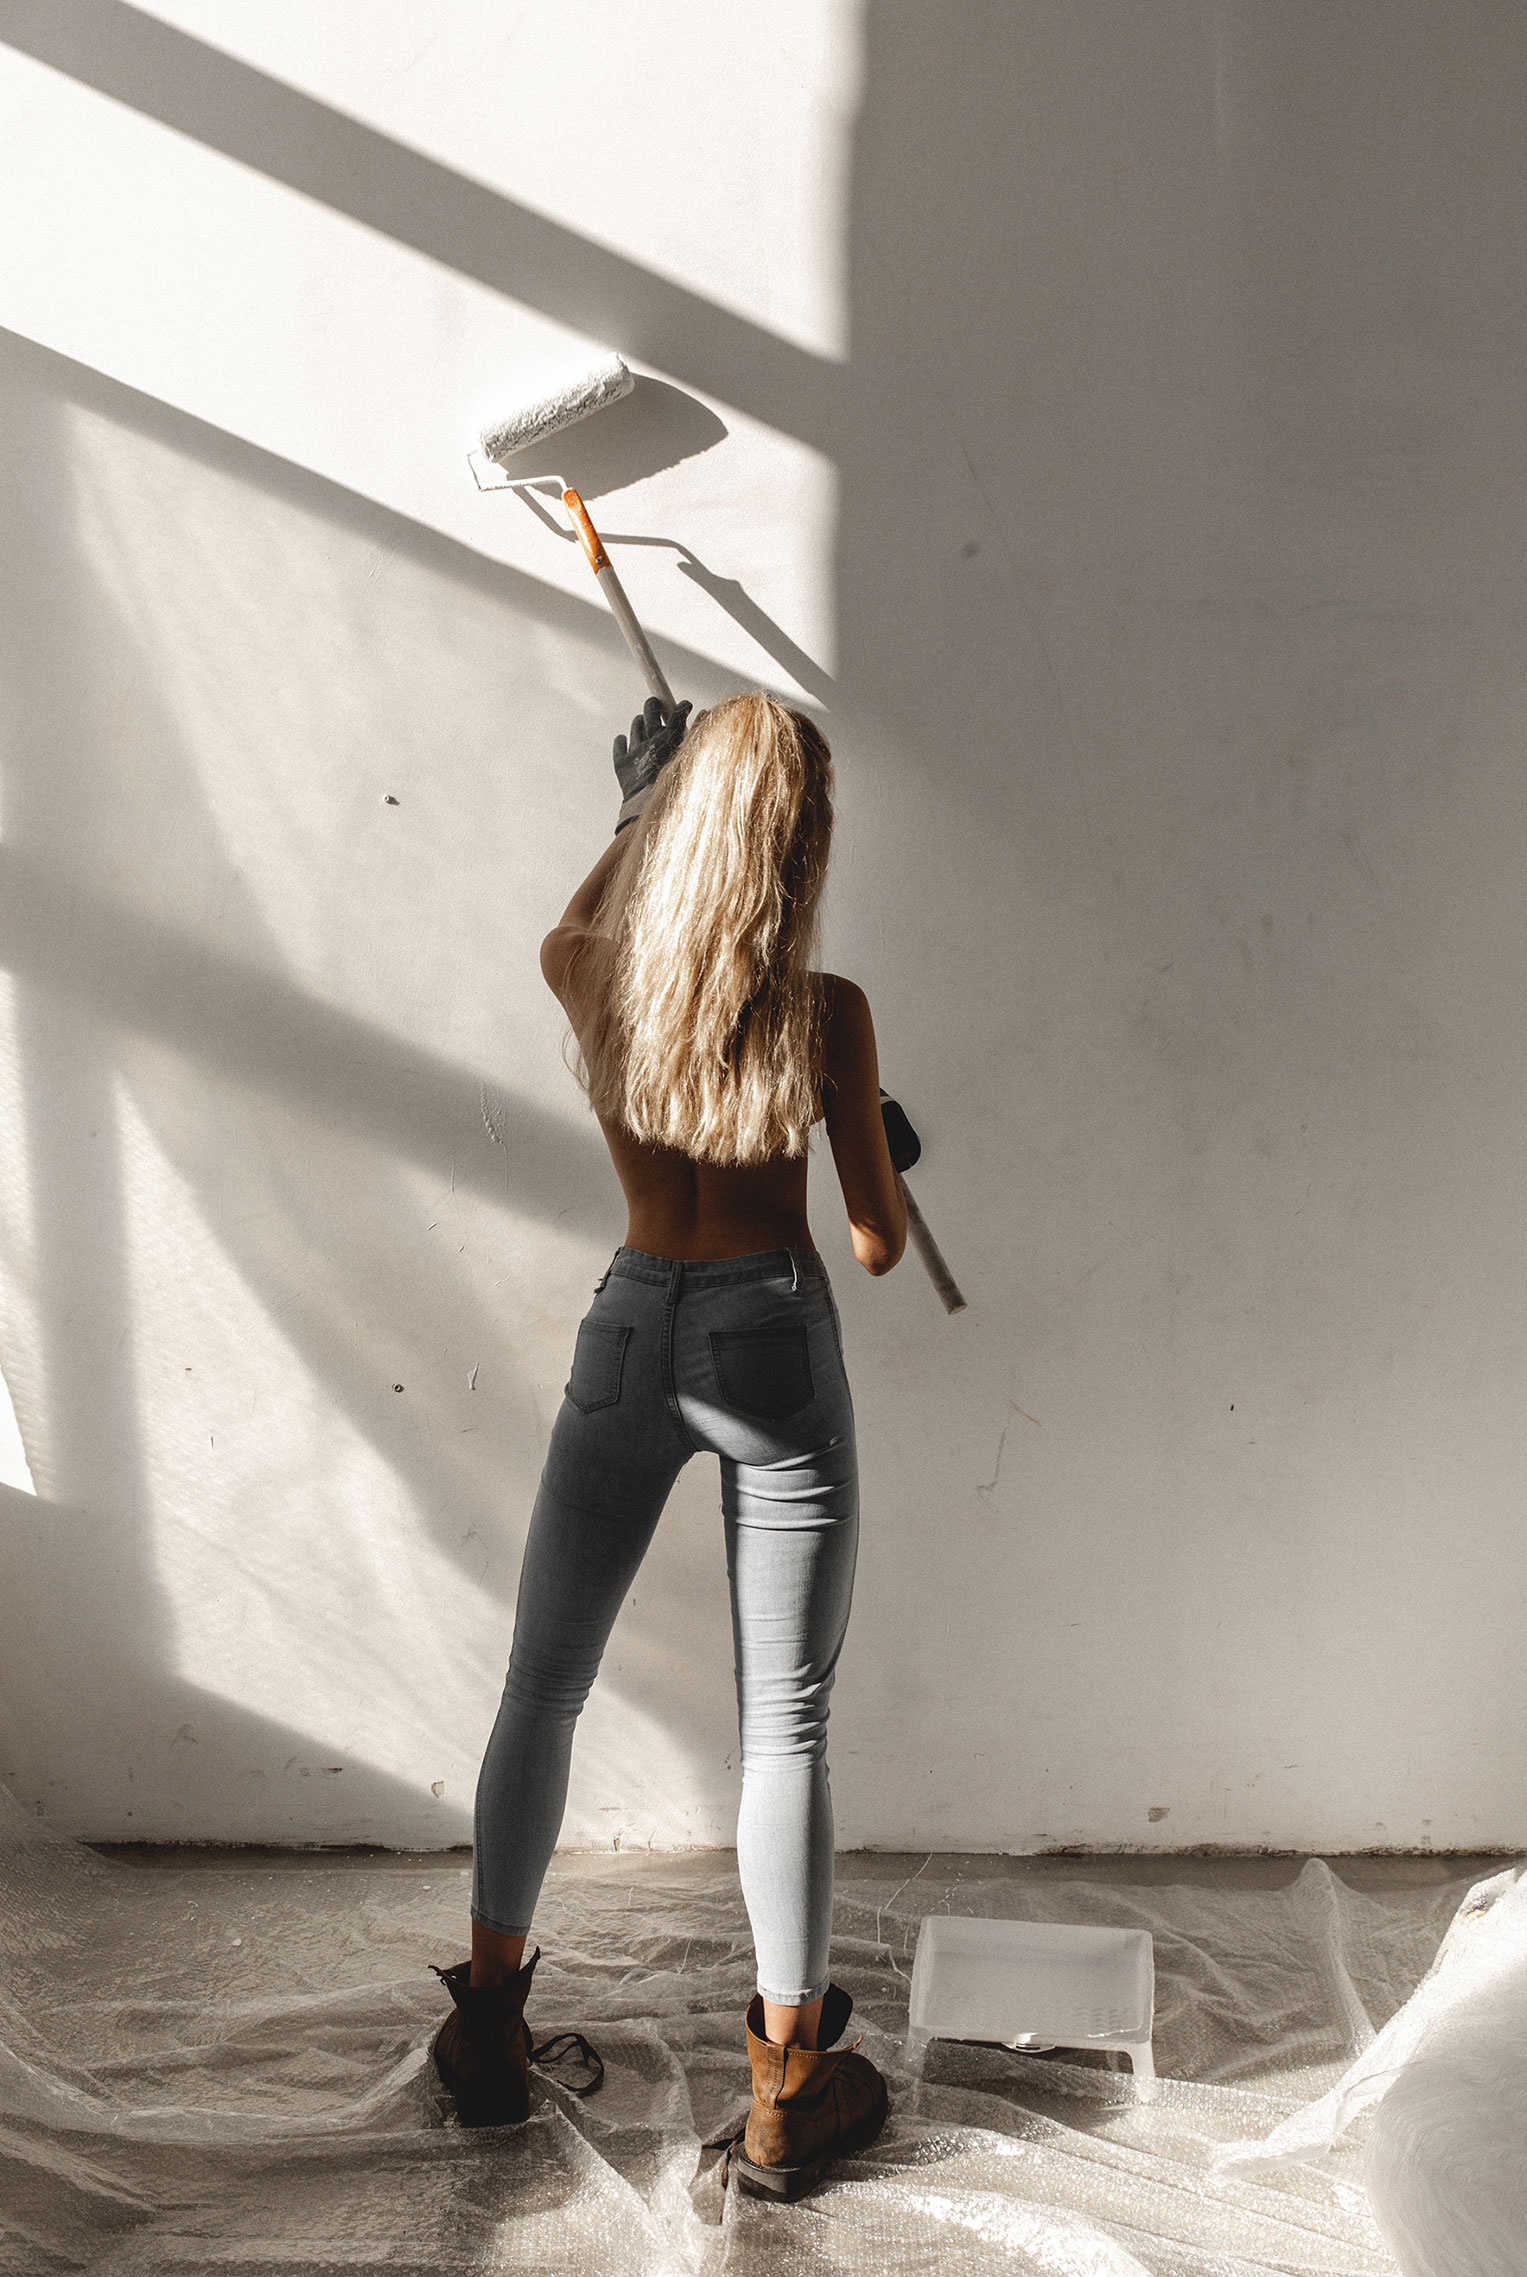 Сексуальная Маша красила стены и заляпалась в краске / фото 07